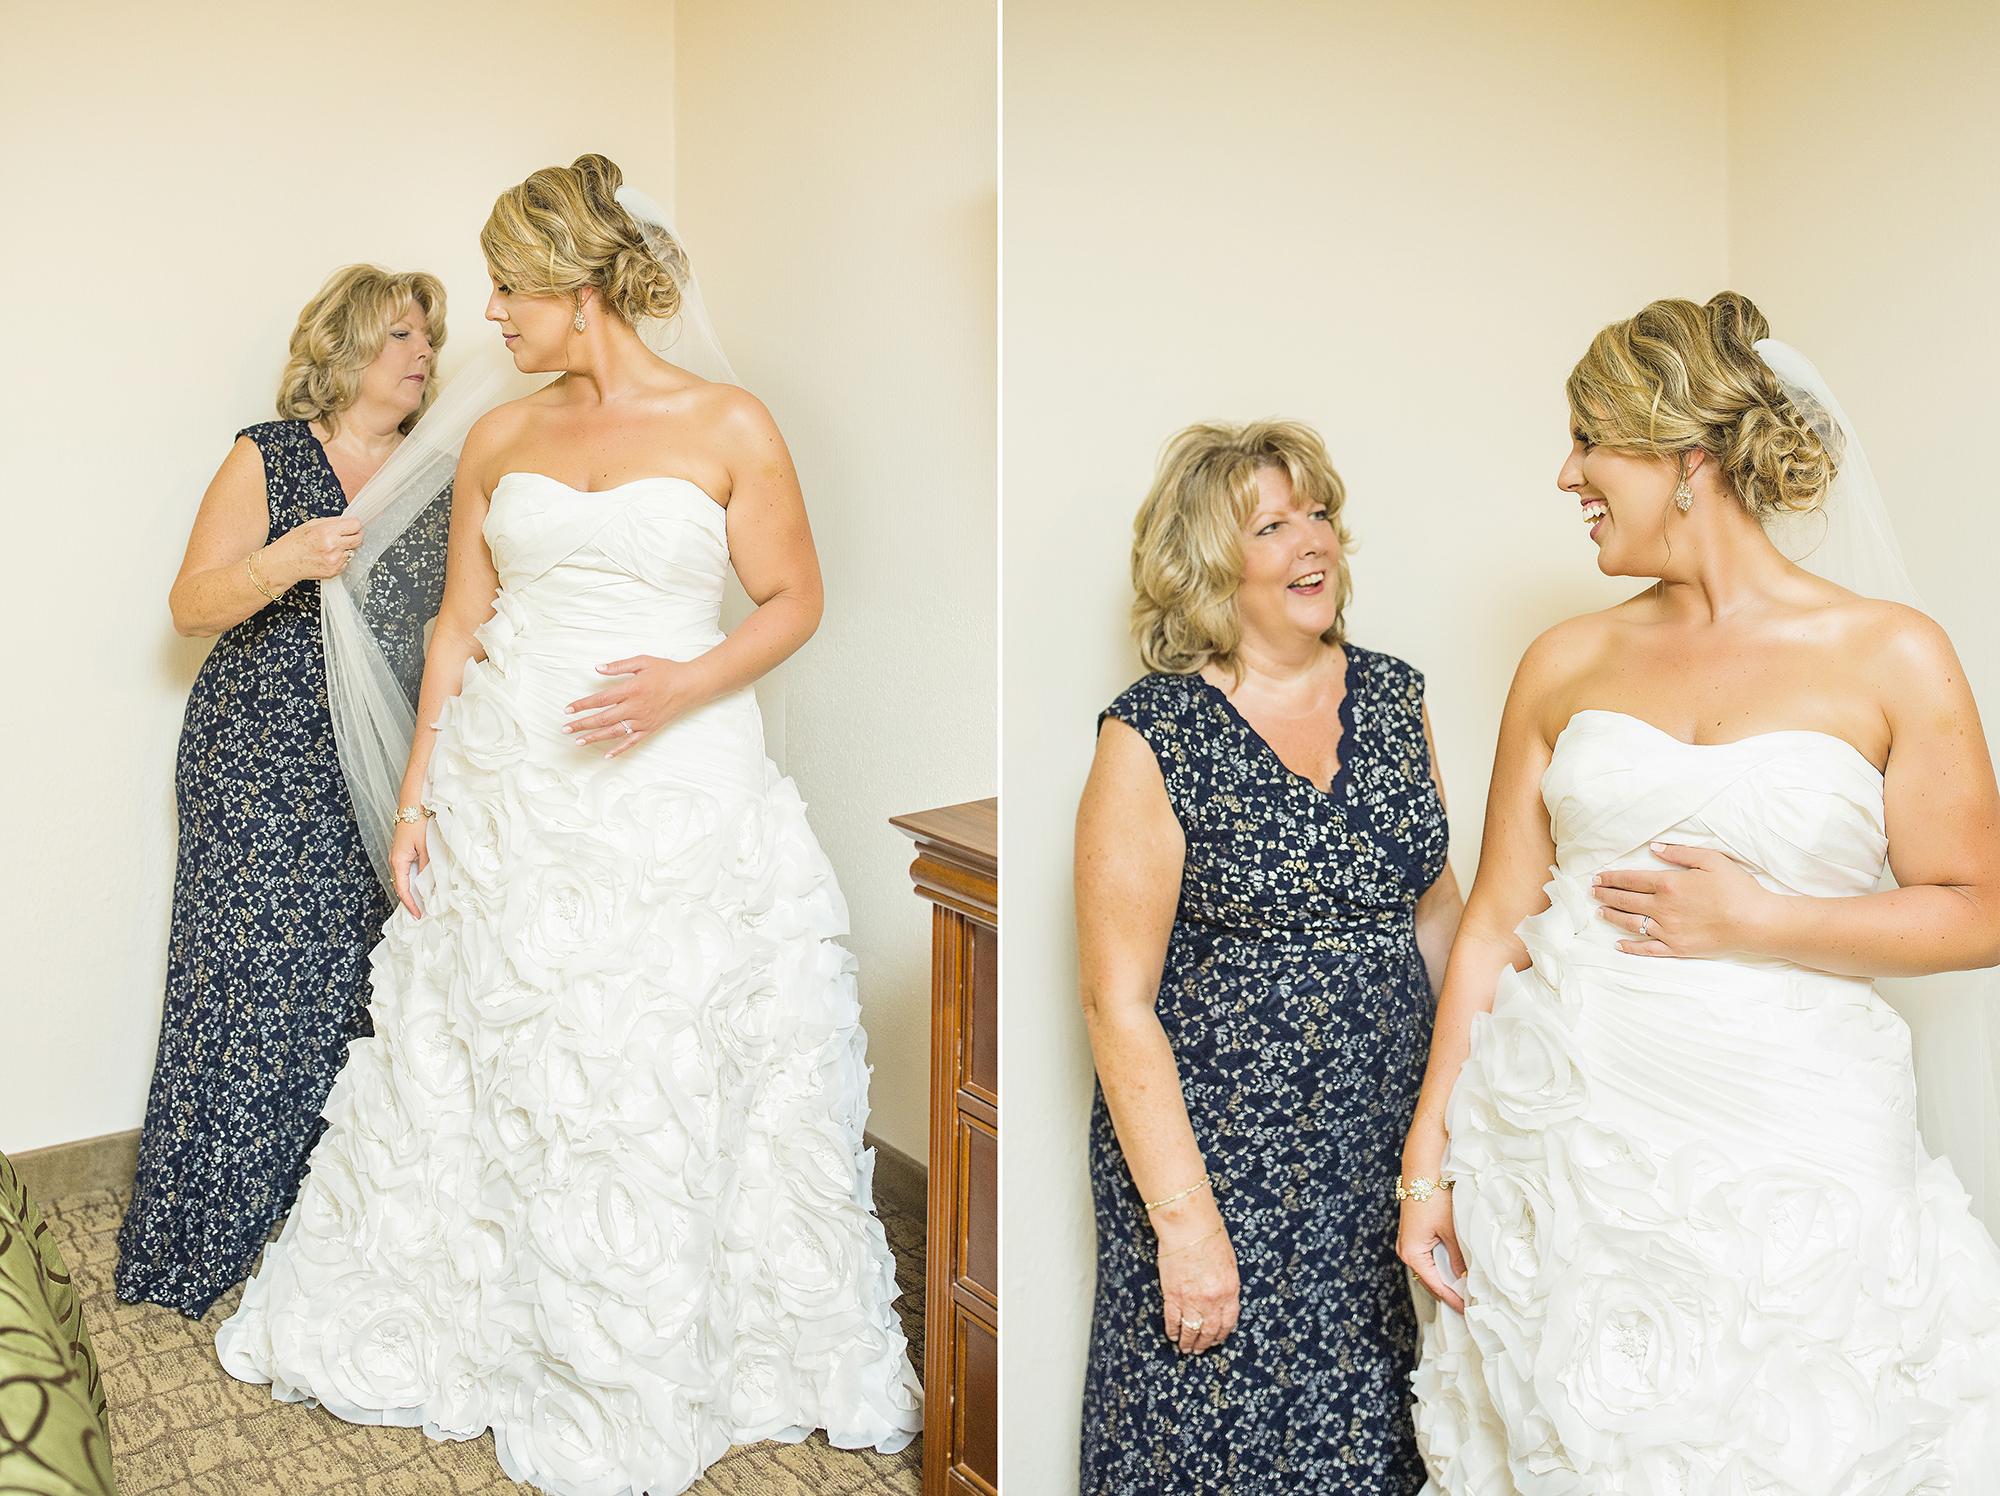 Seriously_Sabrina_Photography_Ashland_Kentucky_Train_Depot_Wedding_Parsons12.jpg